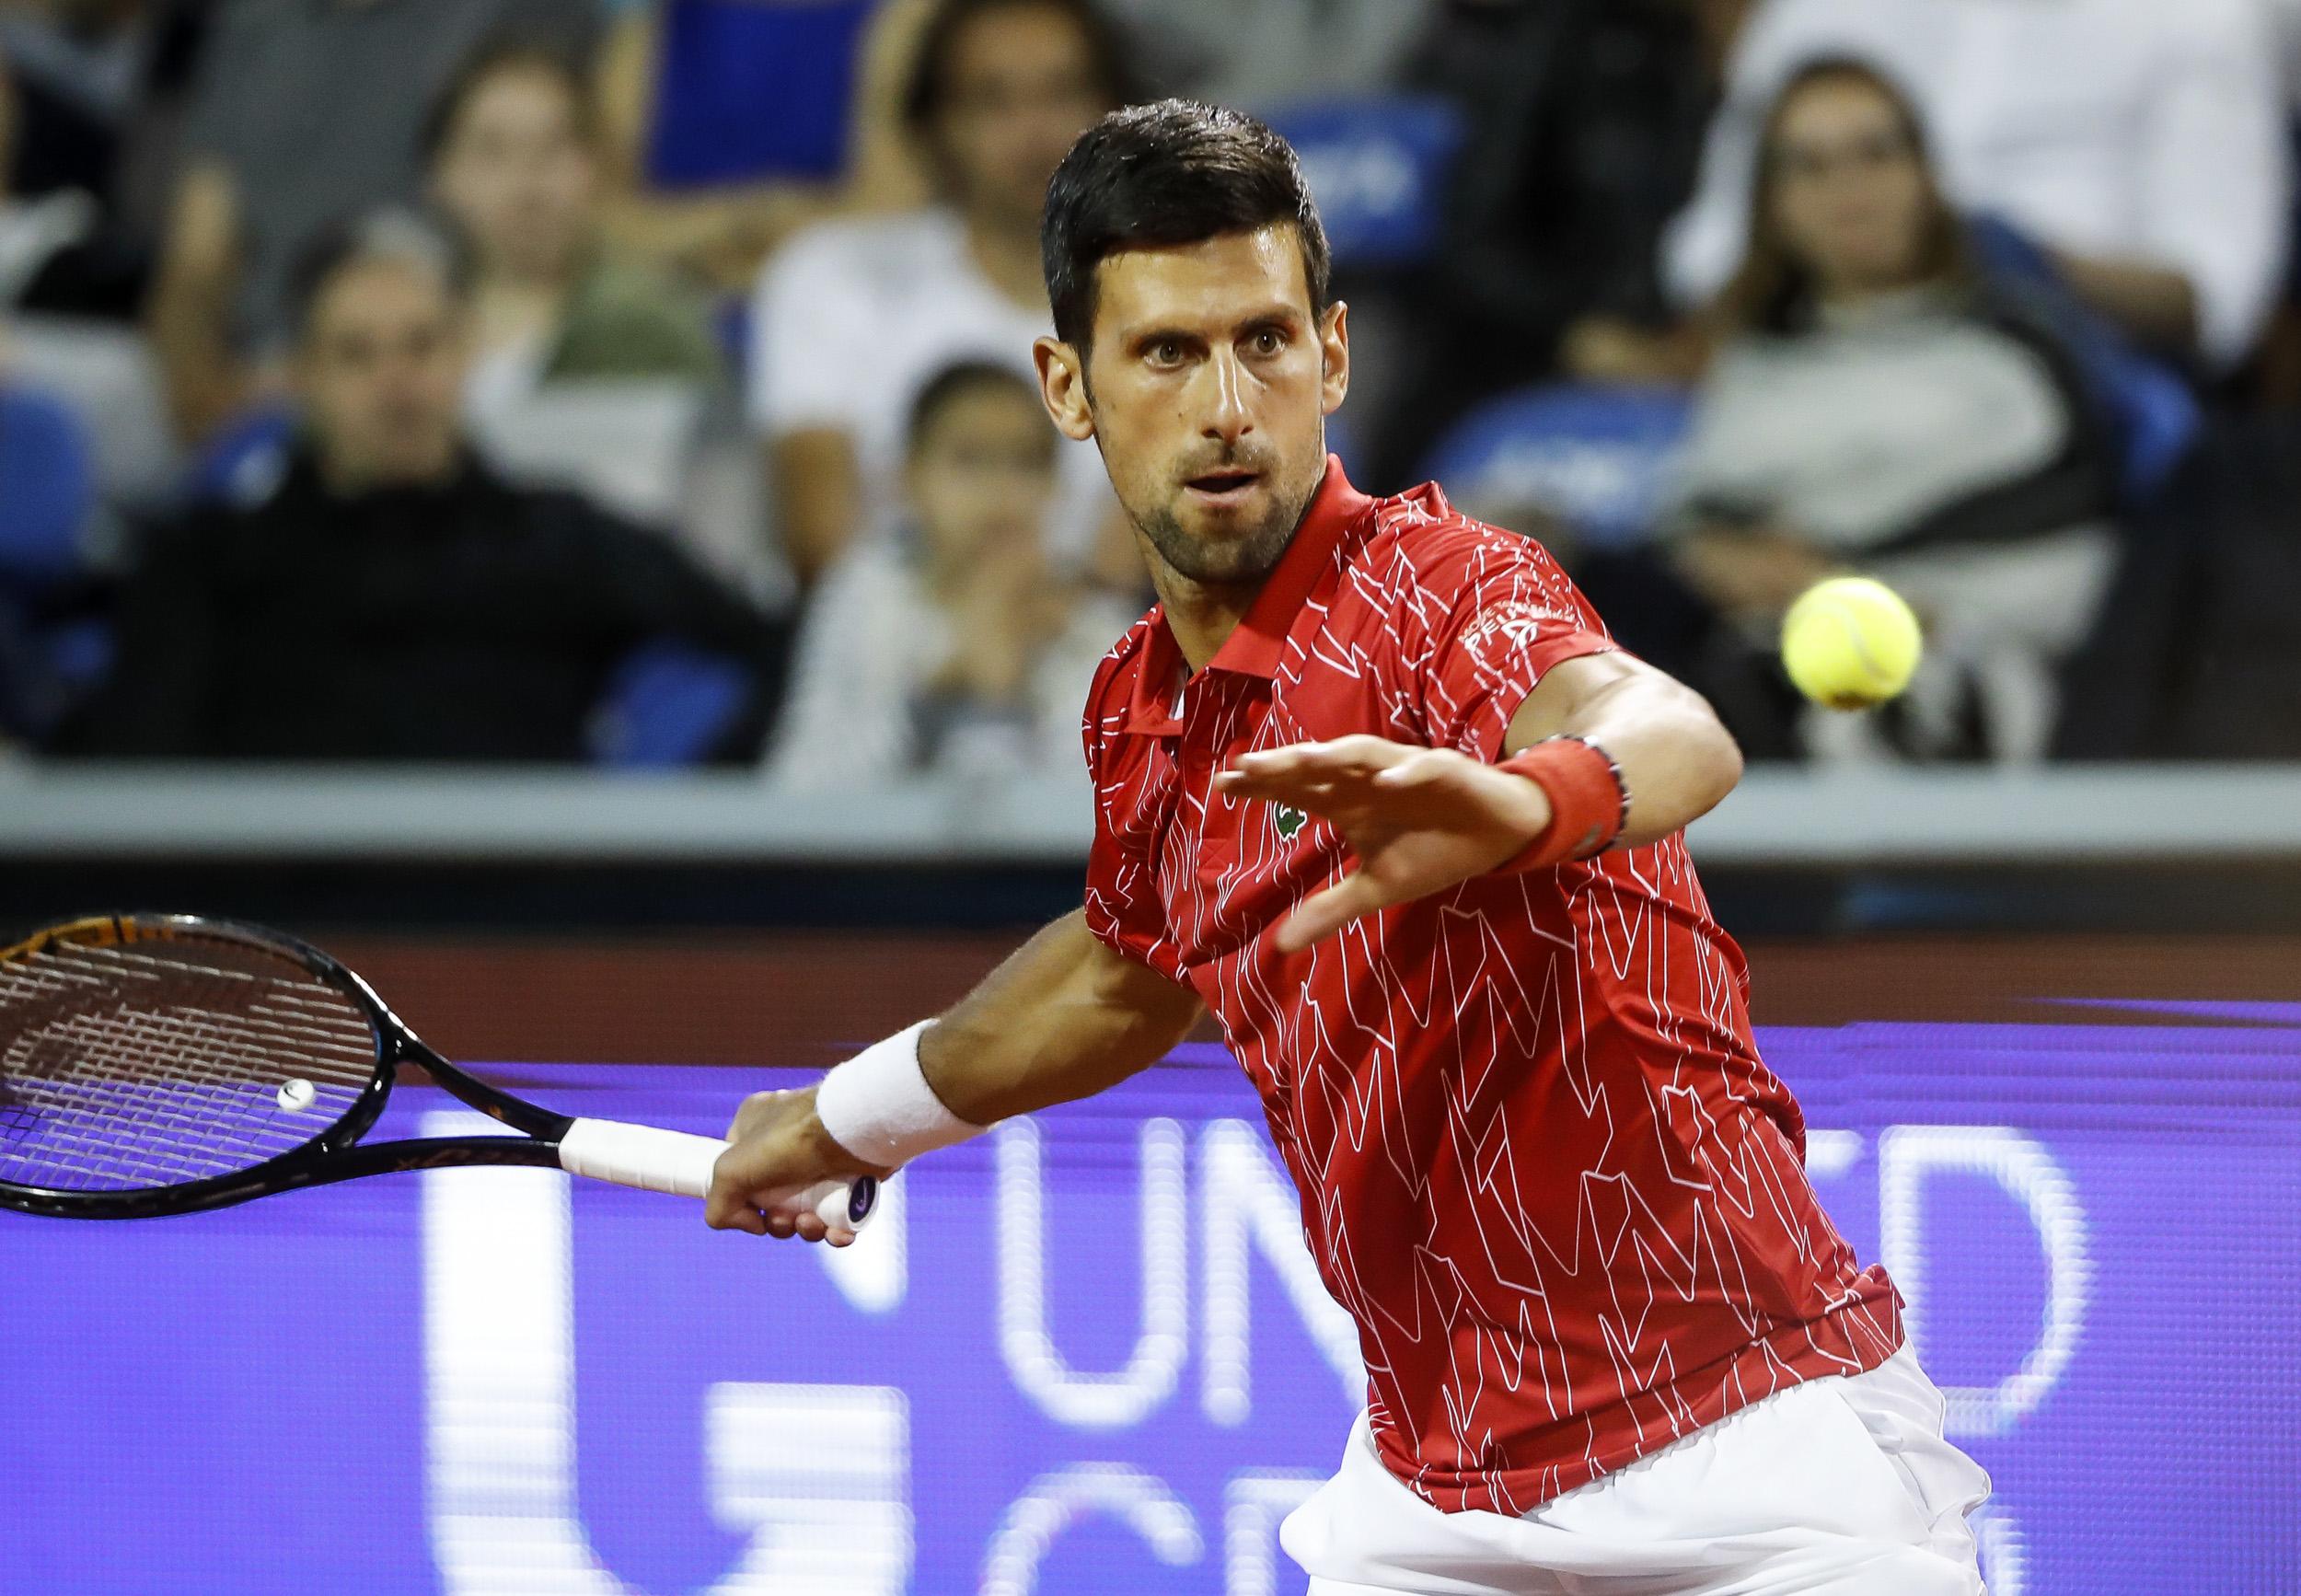 Top Ranked Tennis Star Novak Djokovic Tests Positive For The Coronavirus